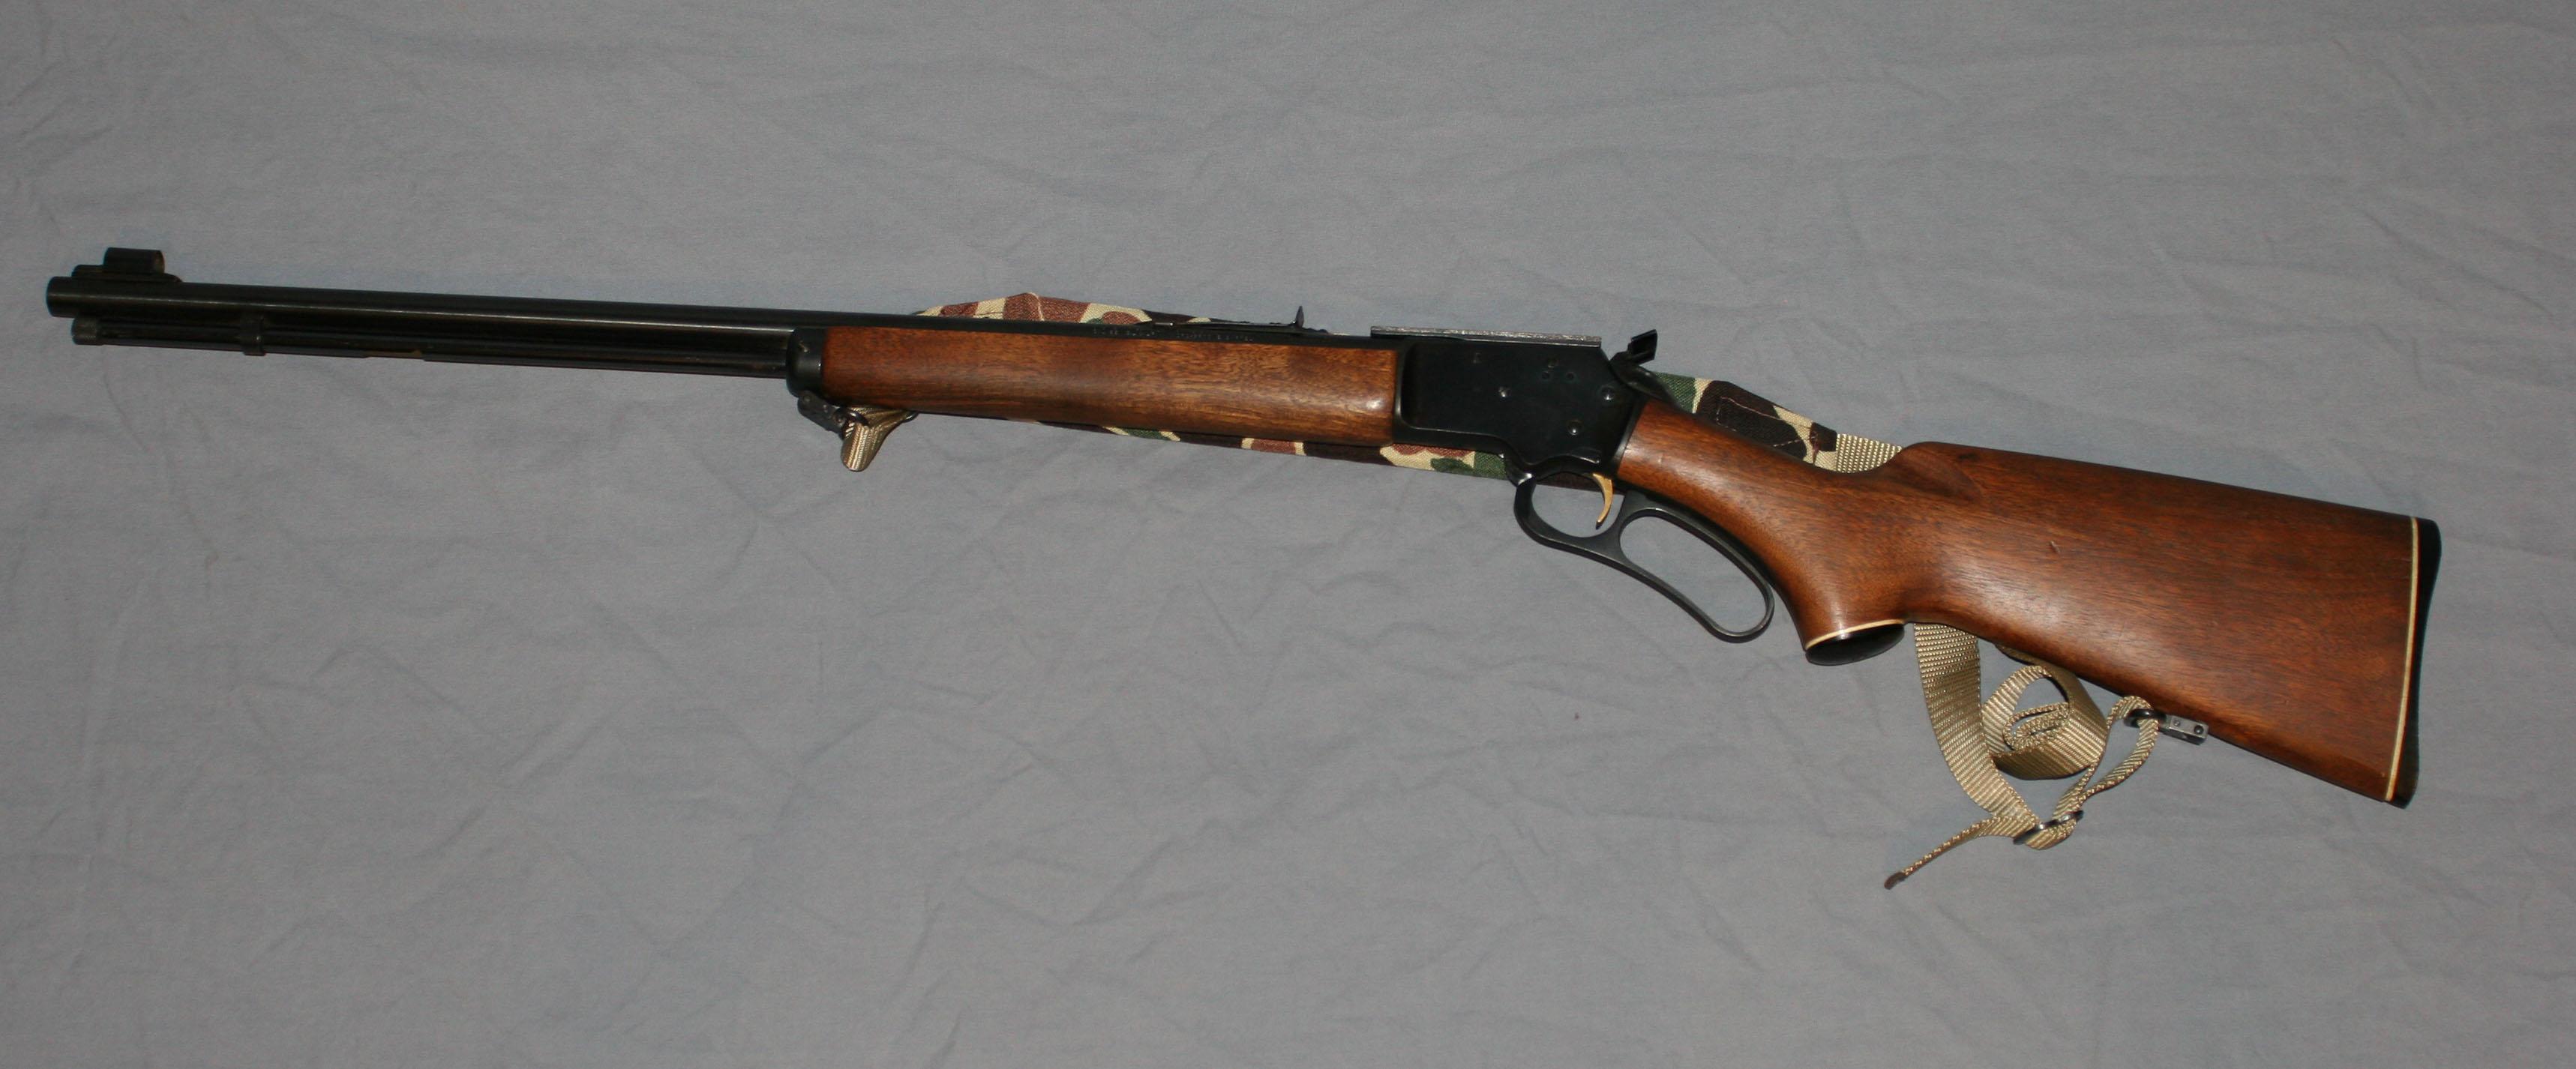 "BackPacker ""Lite"" – Marlin 39A – Grizzly Custom Guns"